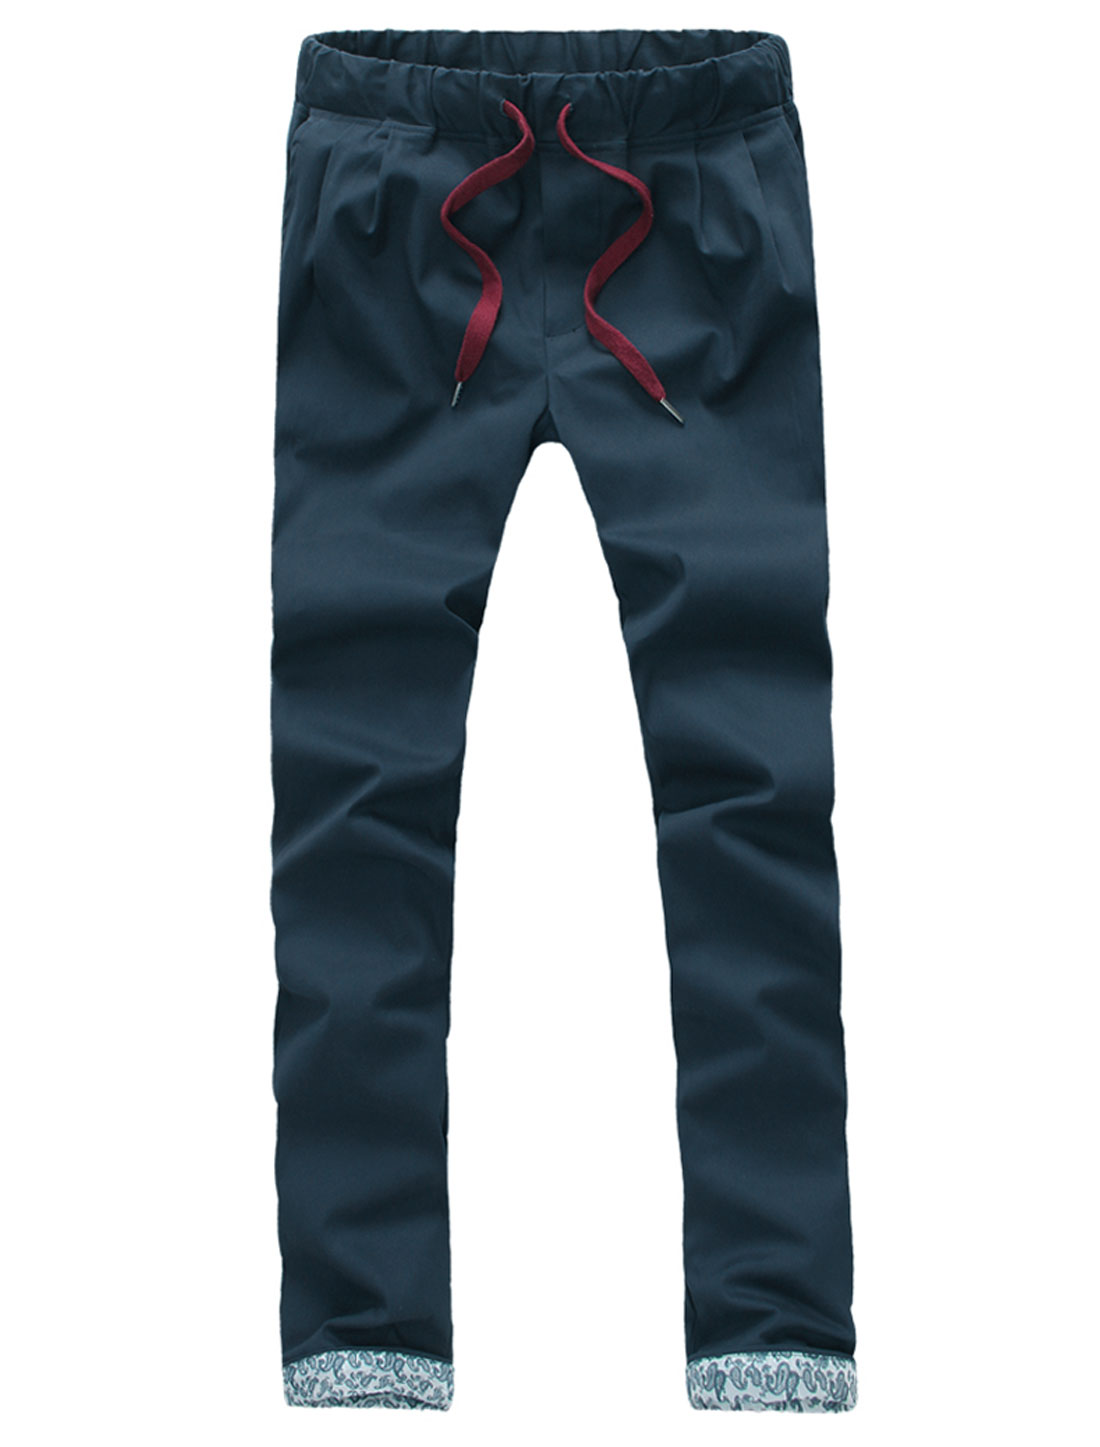 Men Mid Rise Elastic Waist Drawstring Pockets Pants Navy Blue W32